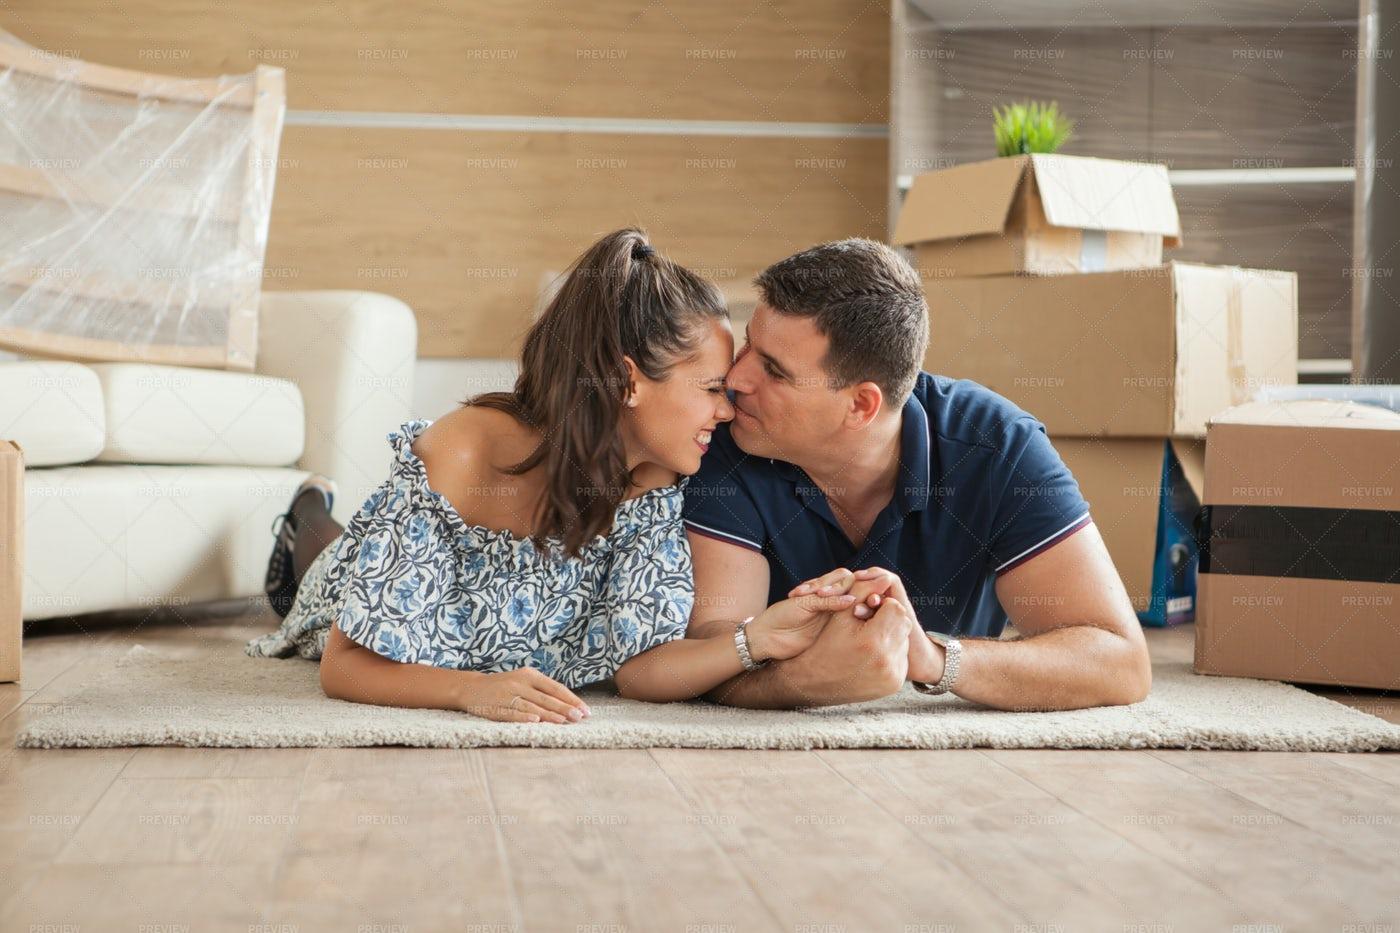 Couple Lying Happy On The Floor: Stock Photos